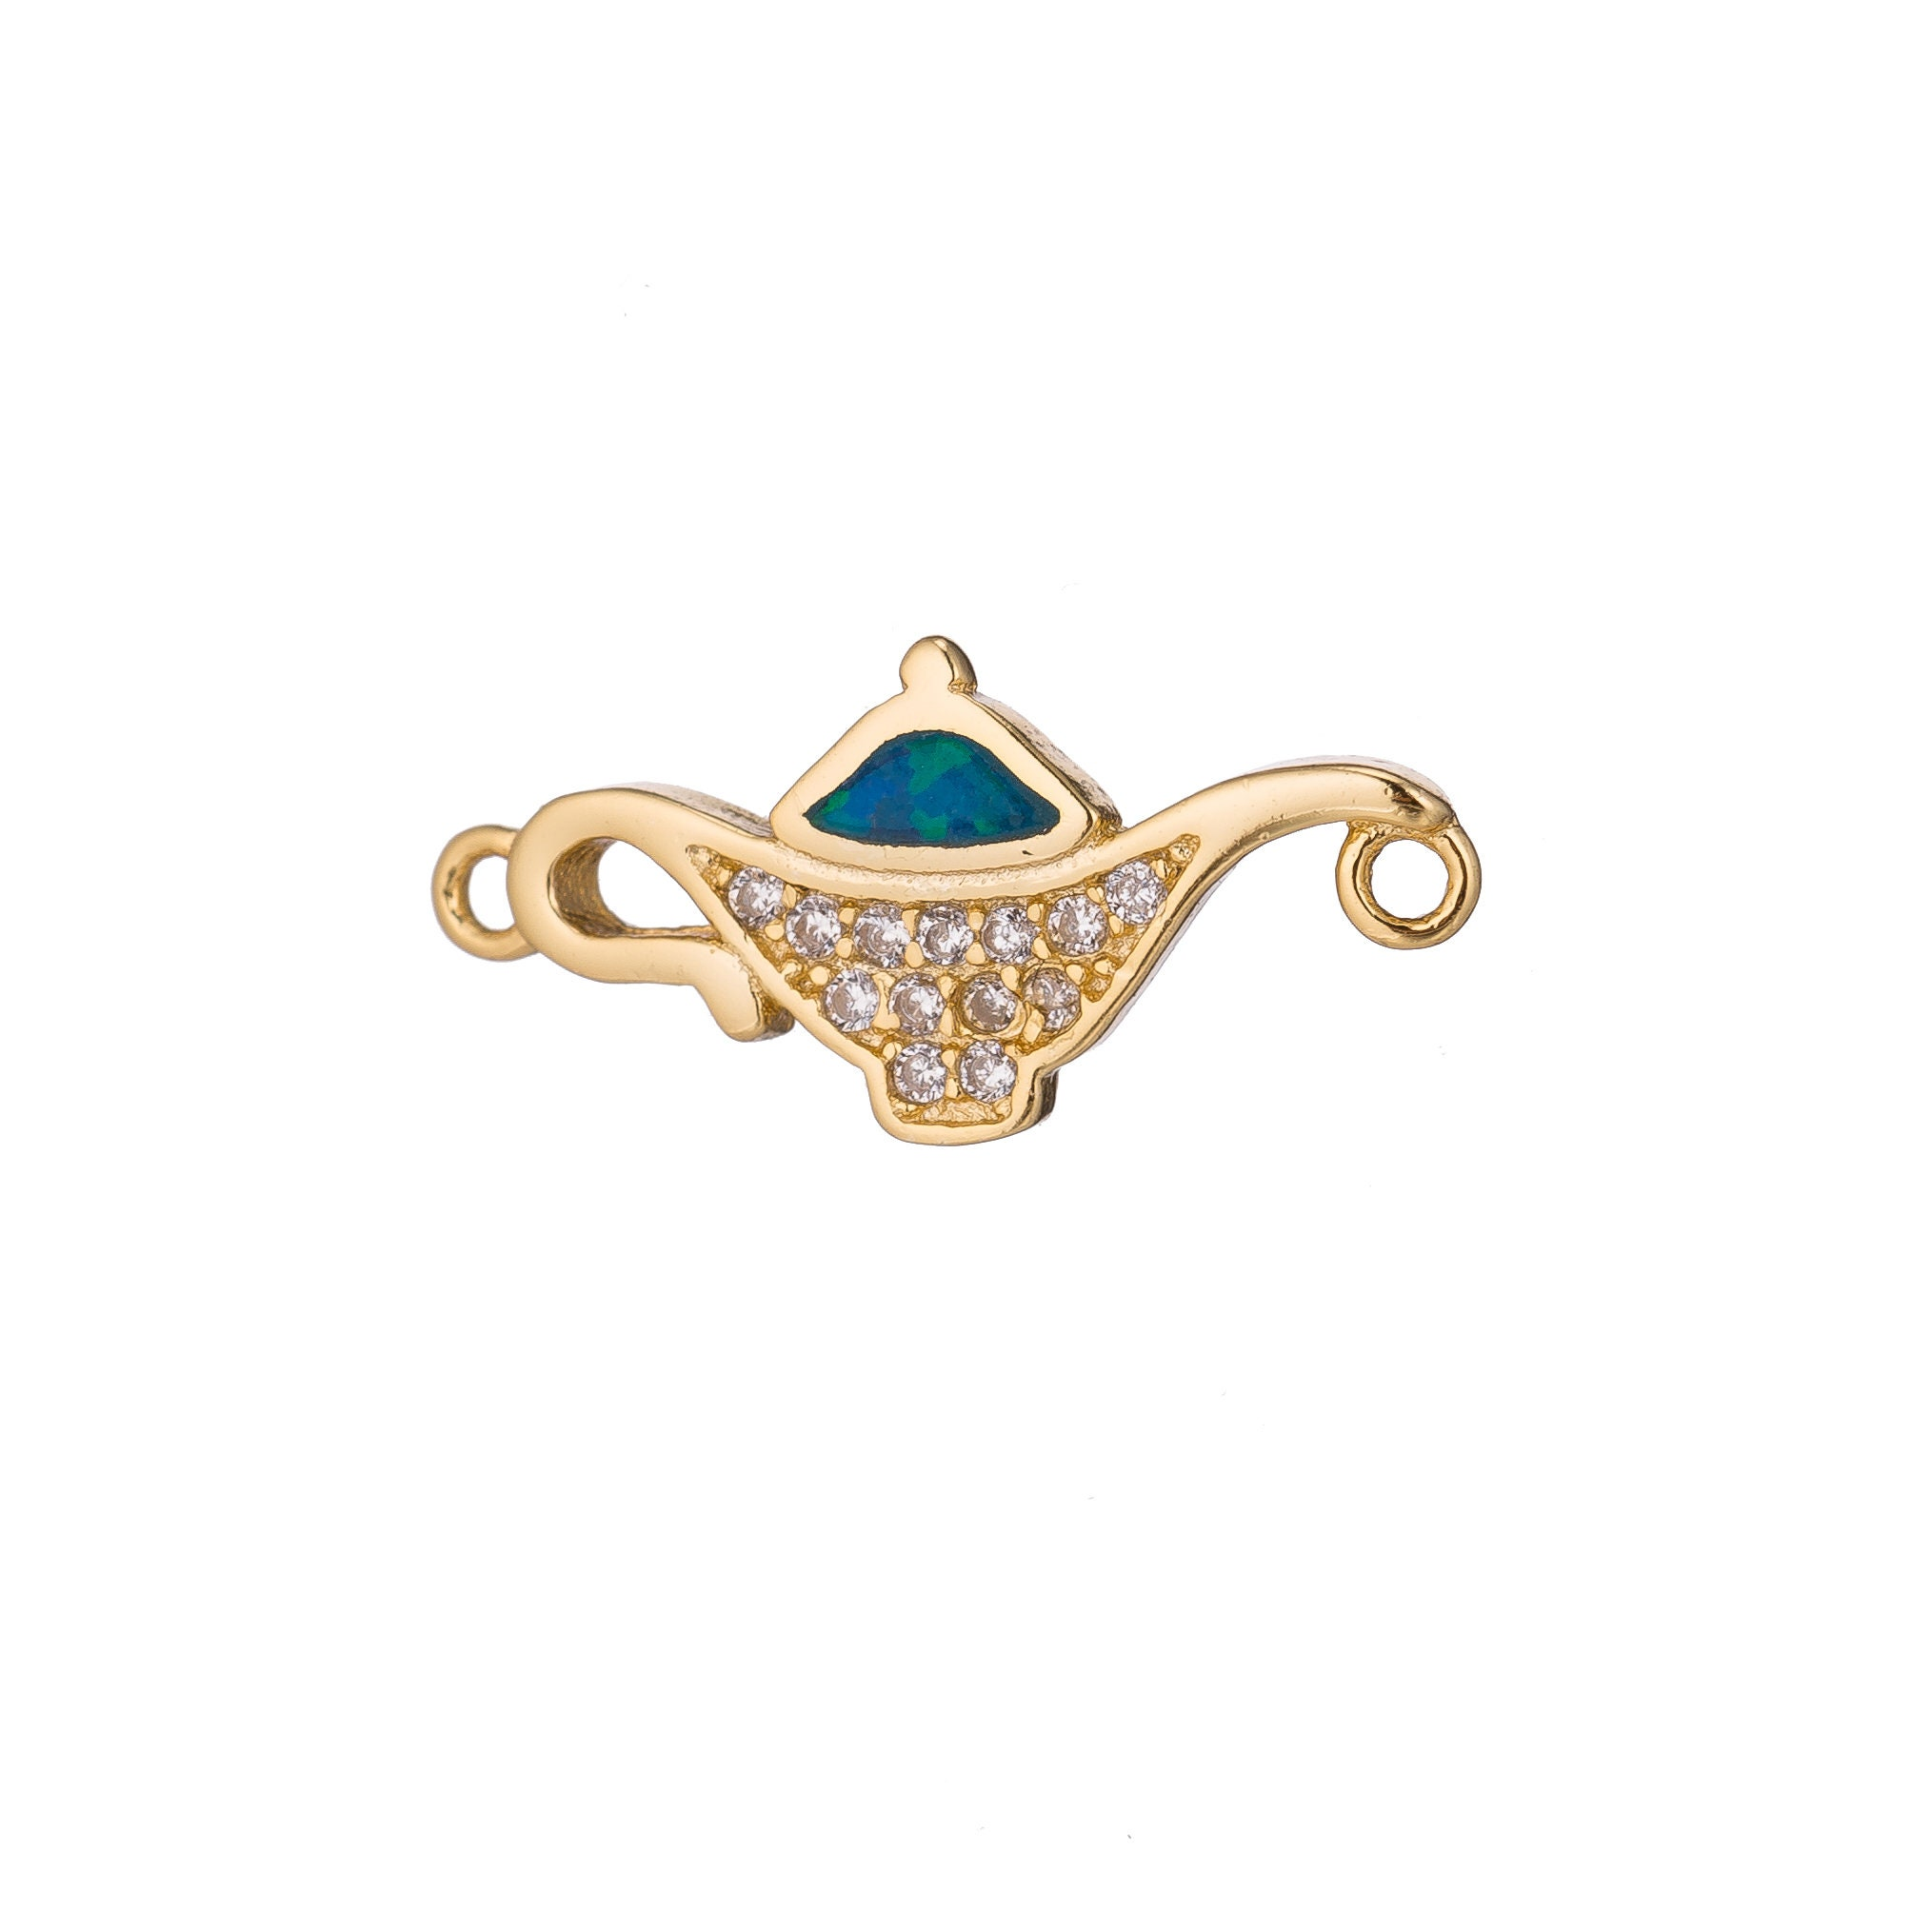 1pc Gold Aladdin s Genie in a Bottle Disney Lover  bef0c33503f0